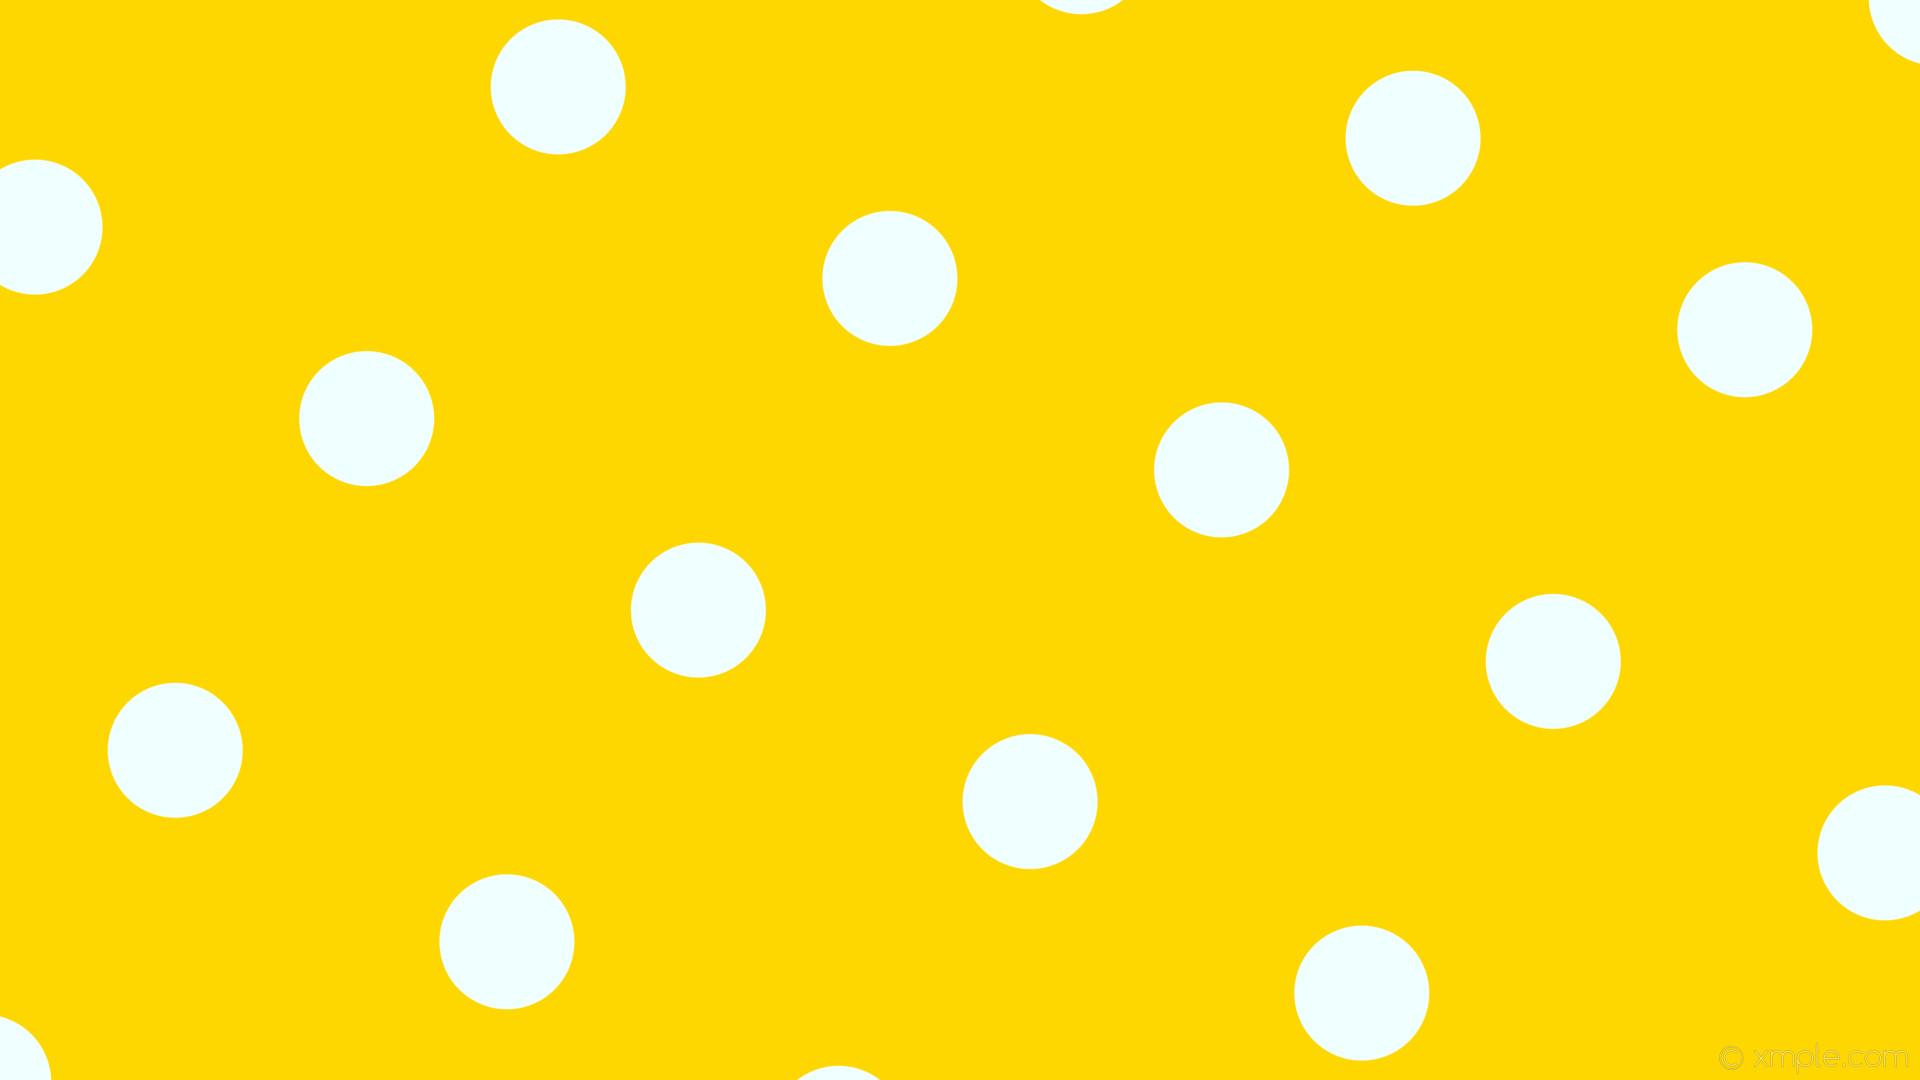 Gold Dot Wallpaper 43 images